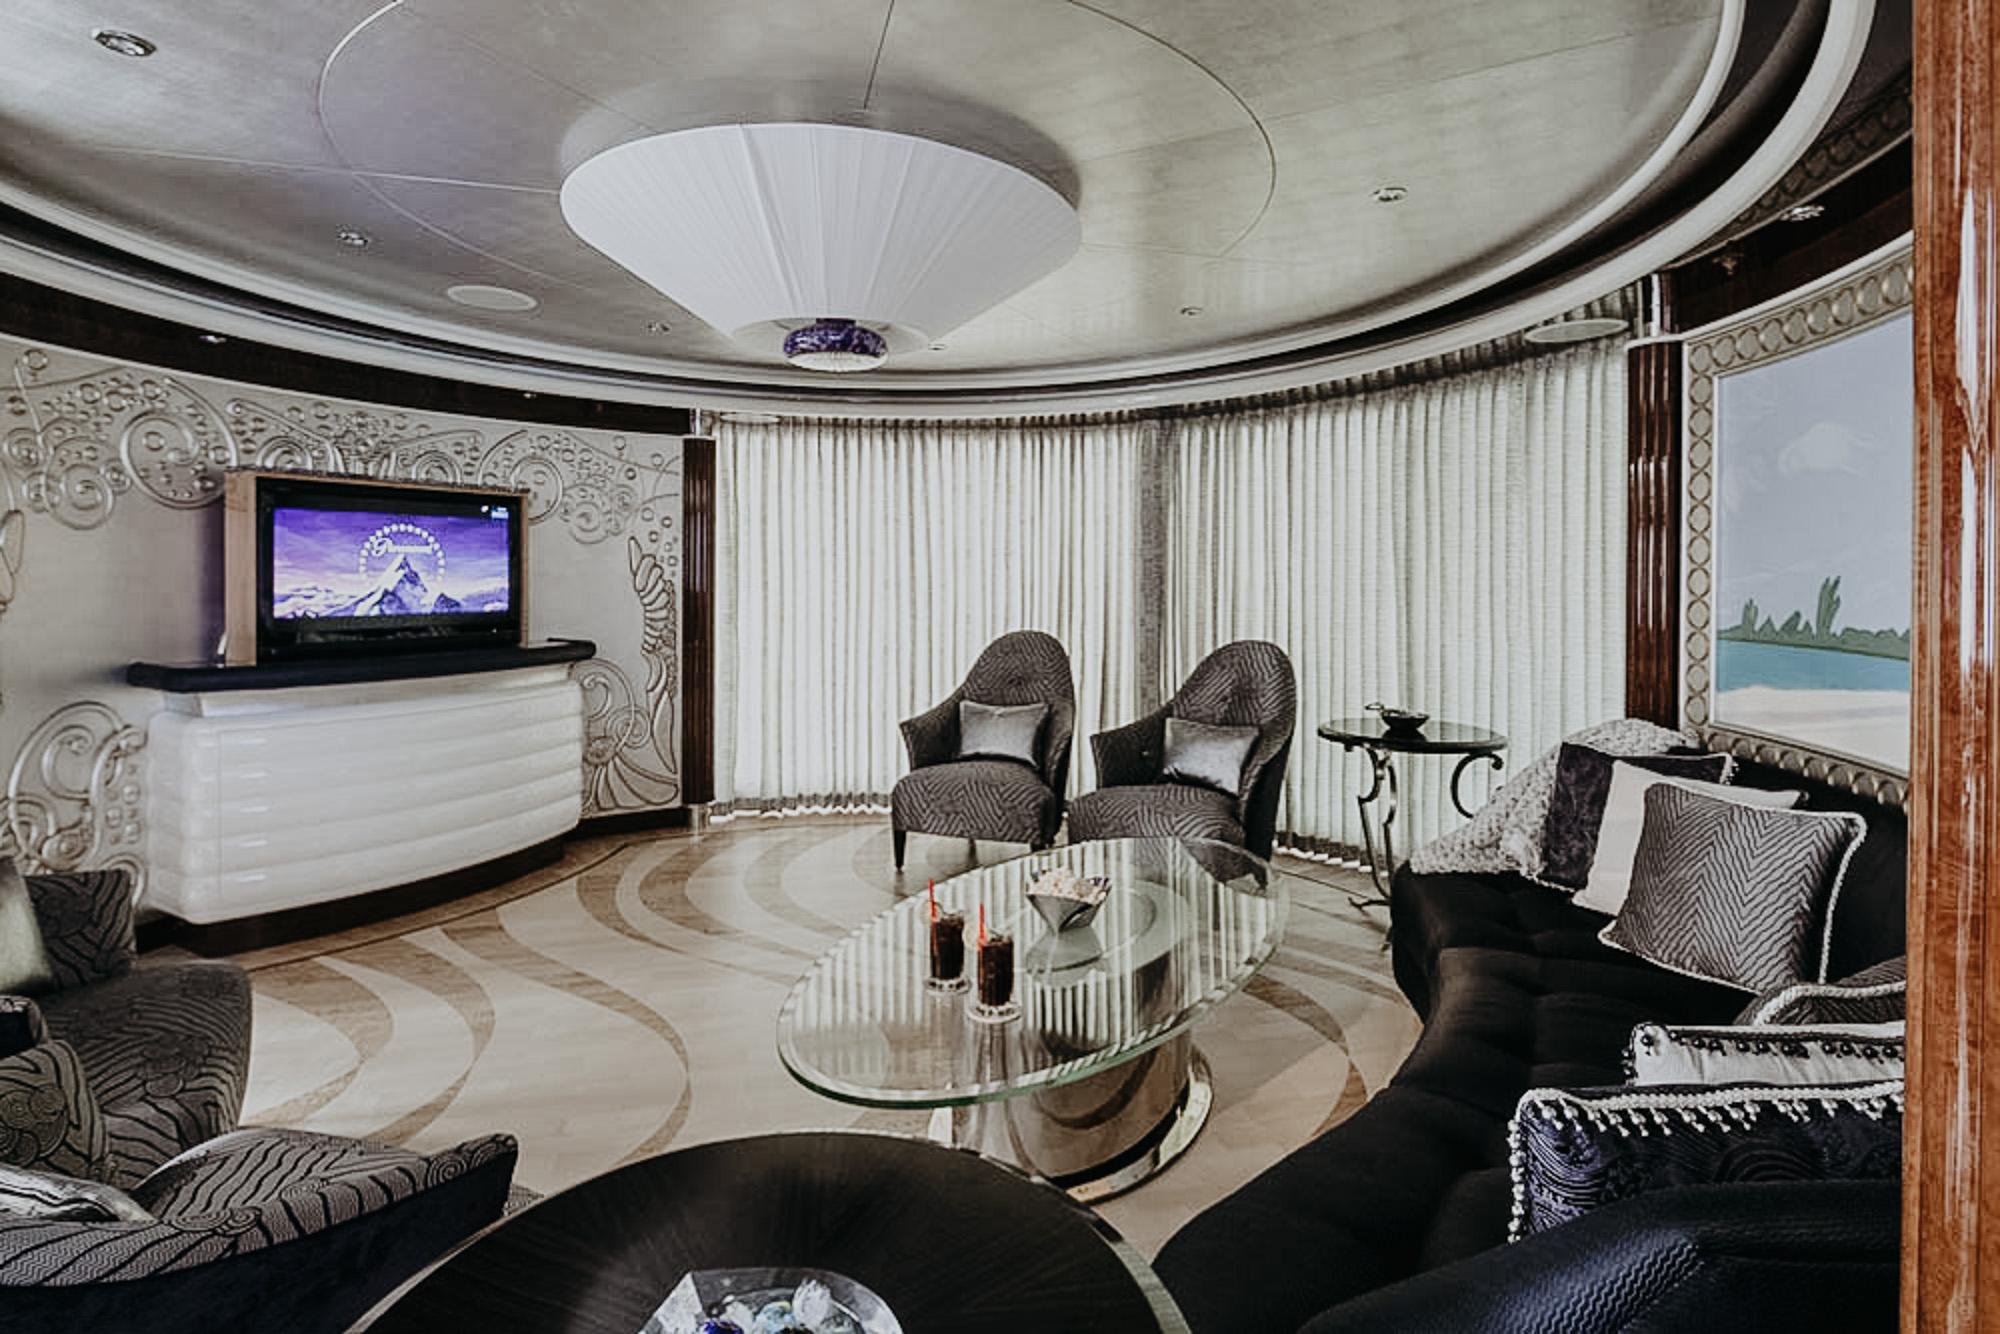 Luxy Superyacht entertainment room